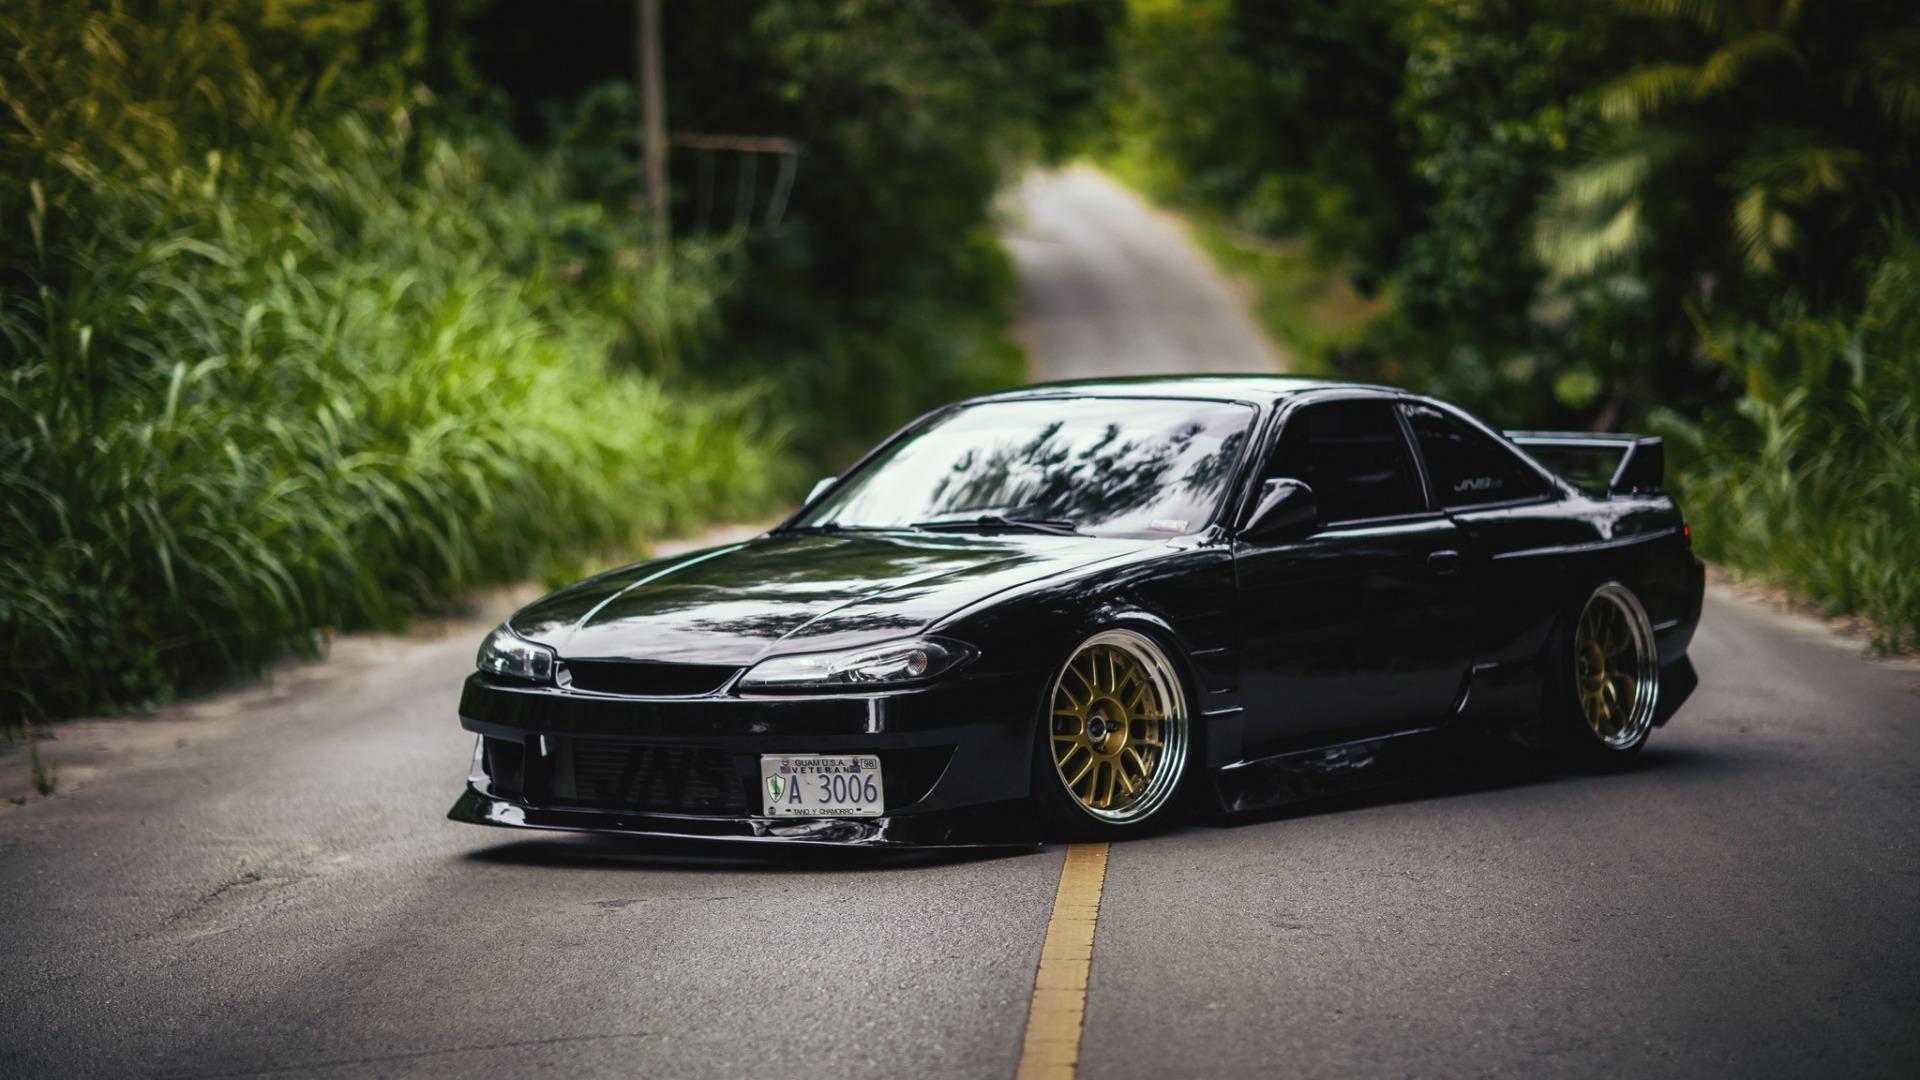 Jdm Nissan Silvia S15